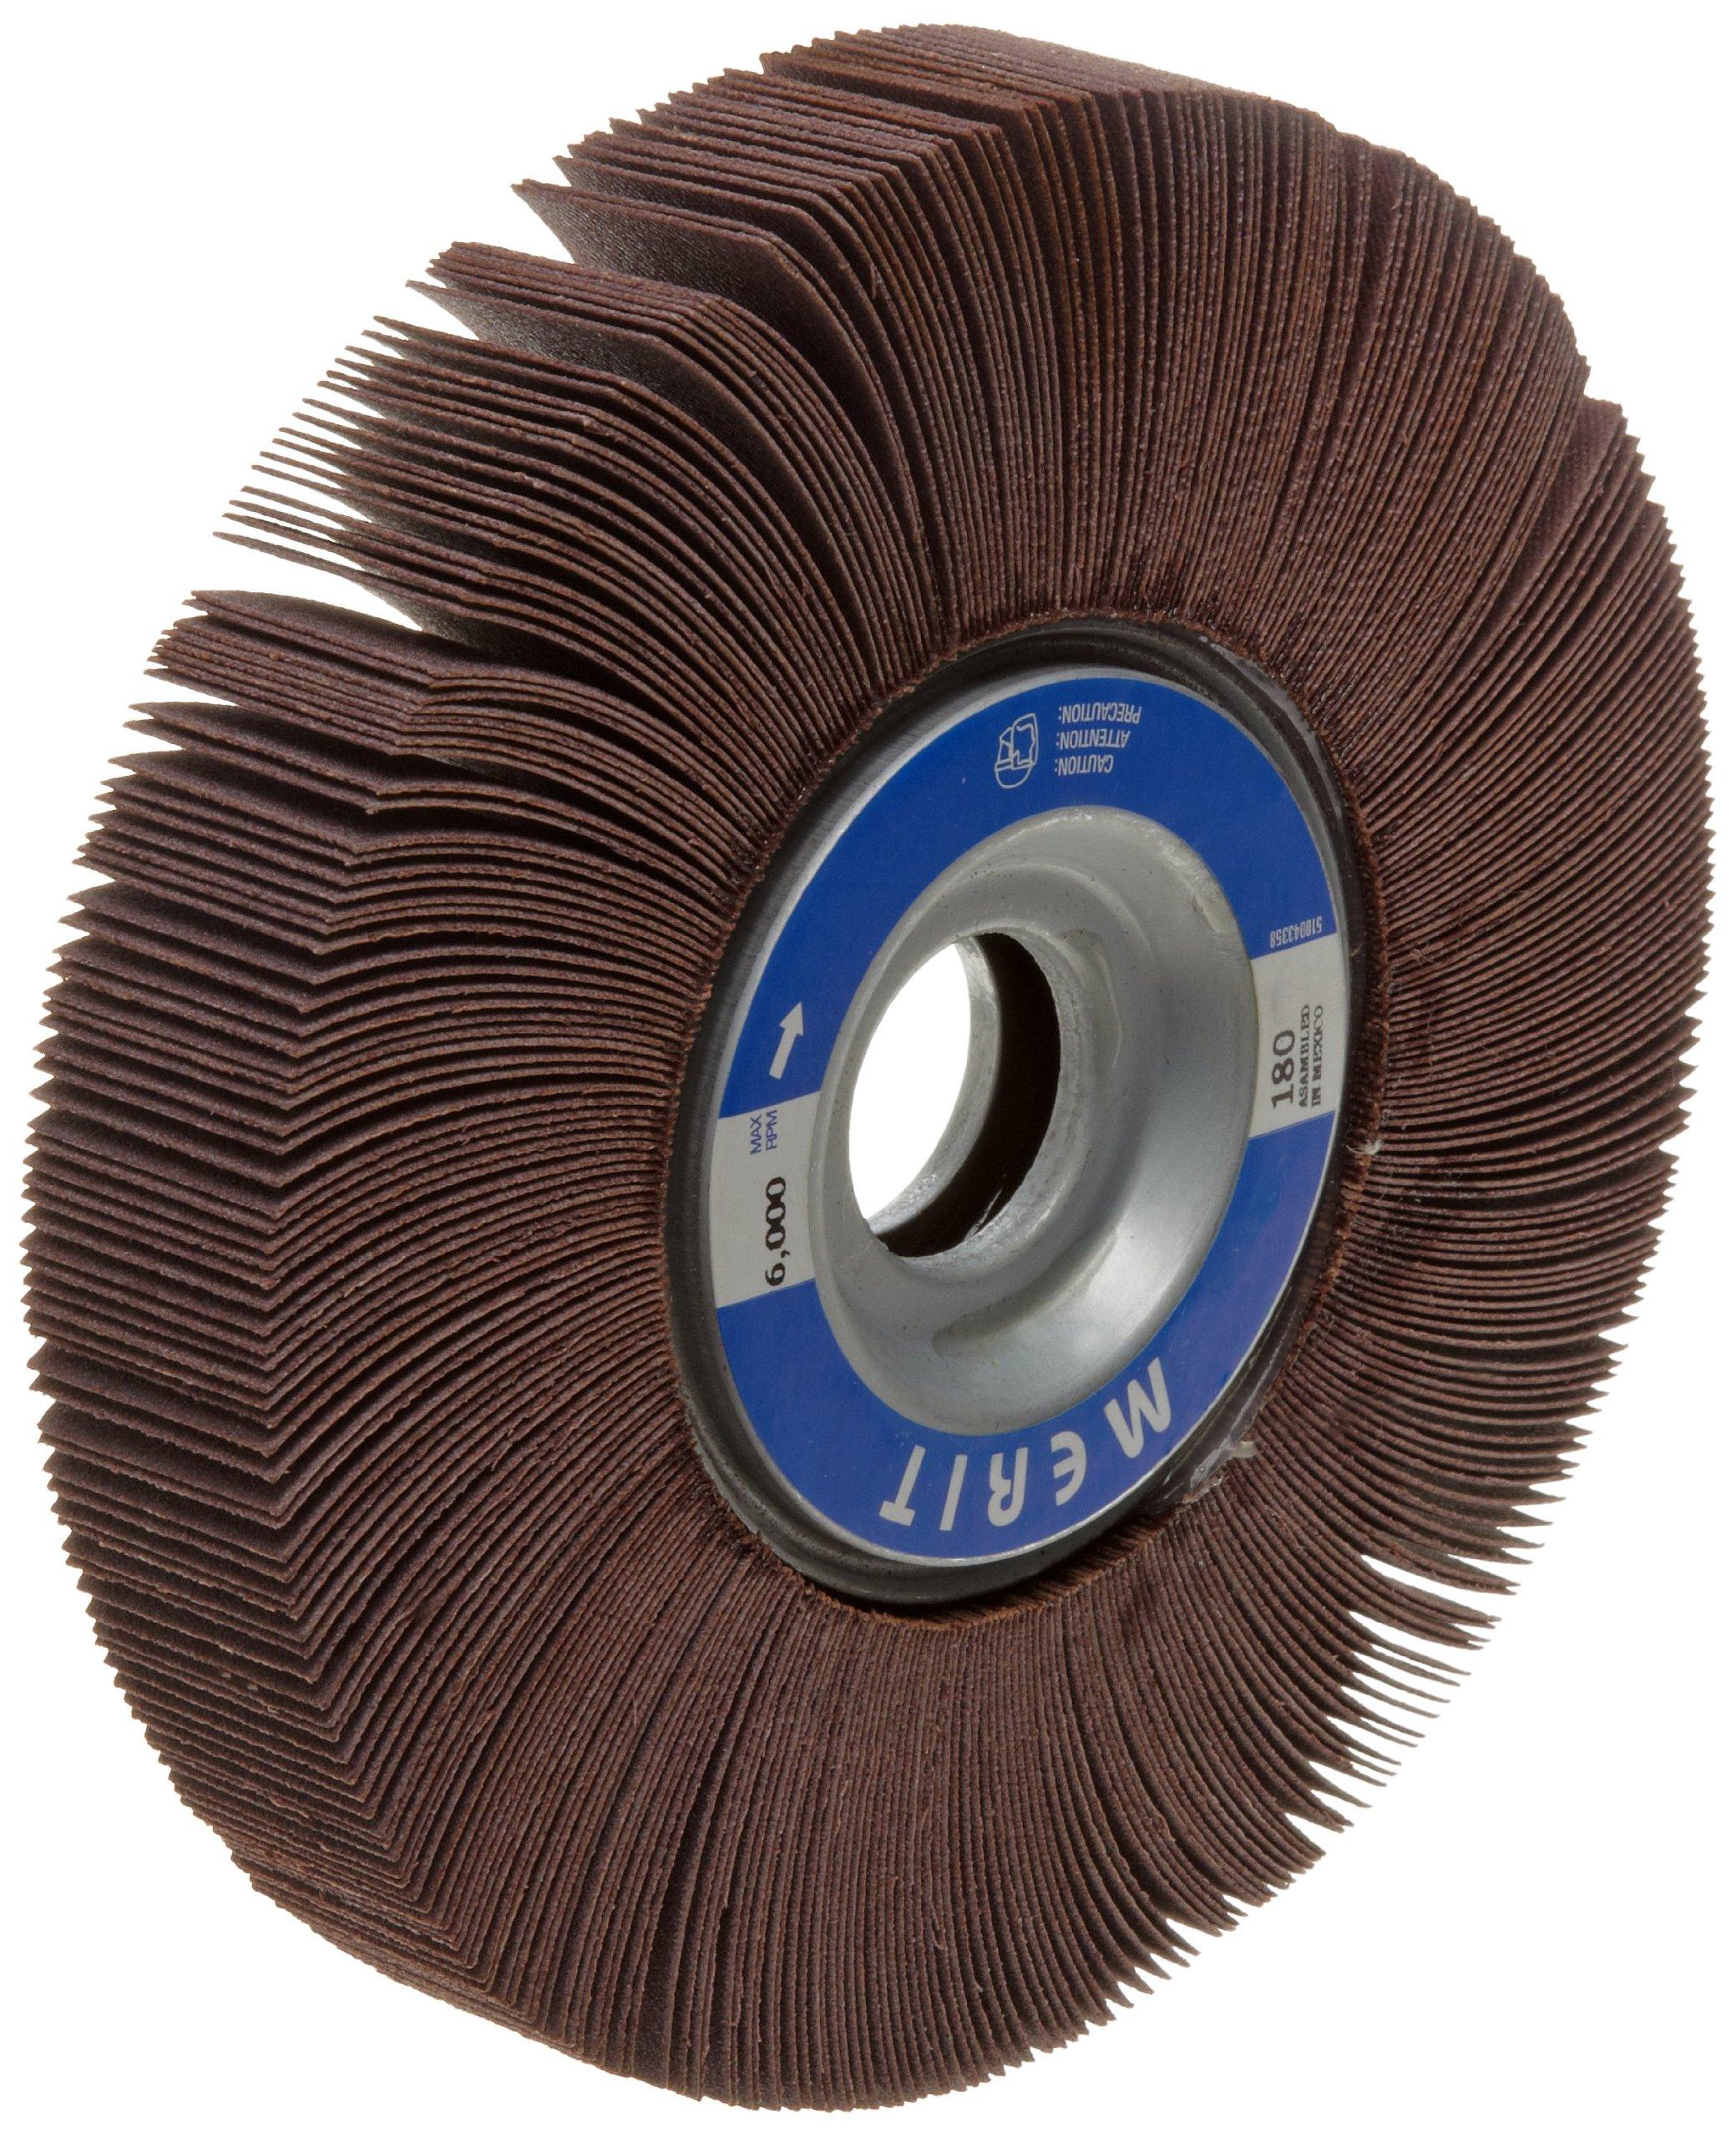 Merit Grind-O-Flex Abrasive Flap Wheel, 1'' Arbor, Round Hole, Ceramic Aluminum Oxide, 8'' Dia., 1'' Face Width, Grit 180, 4500 Max RPM (Pack of 1)